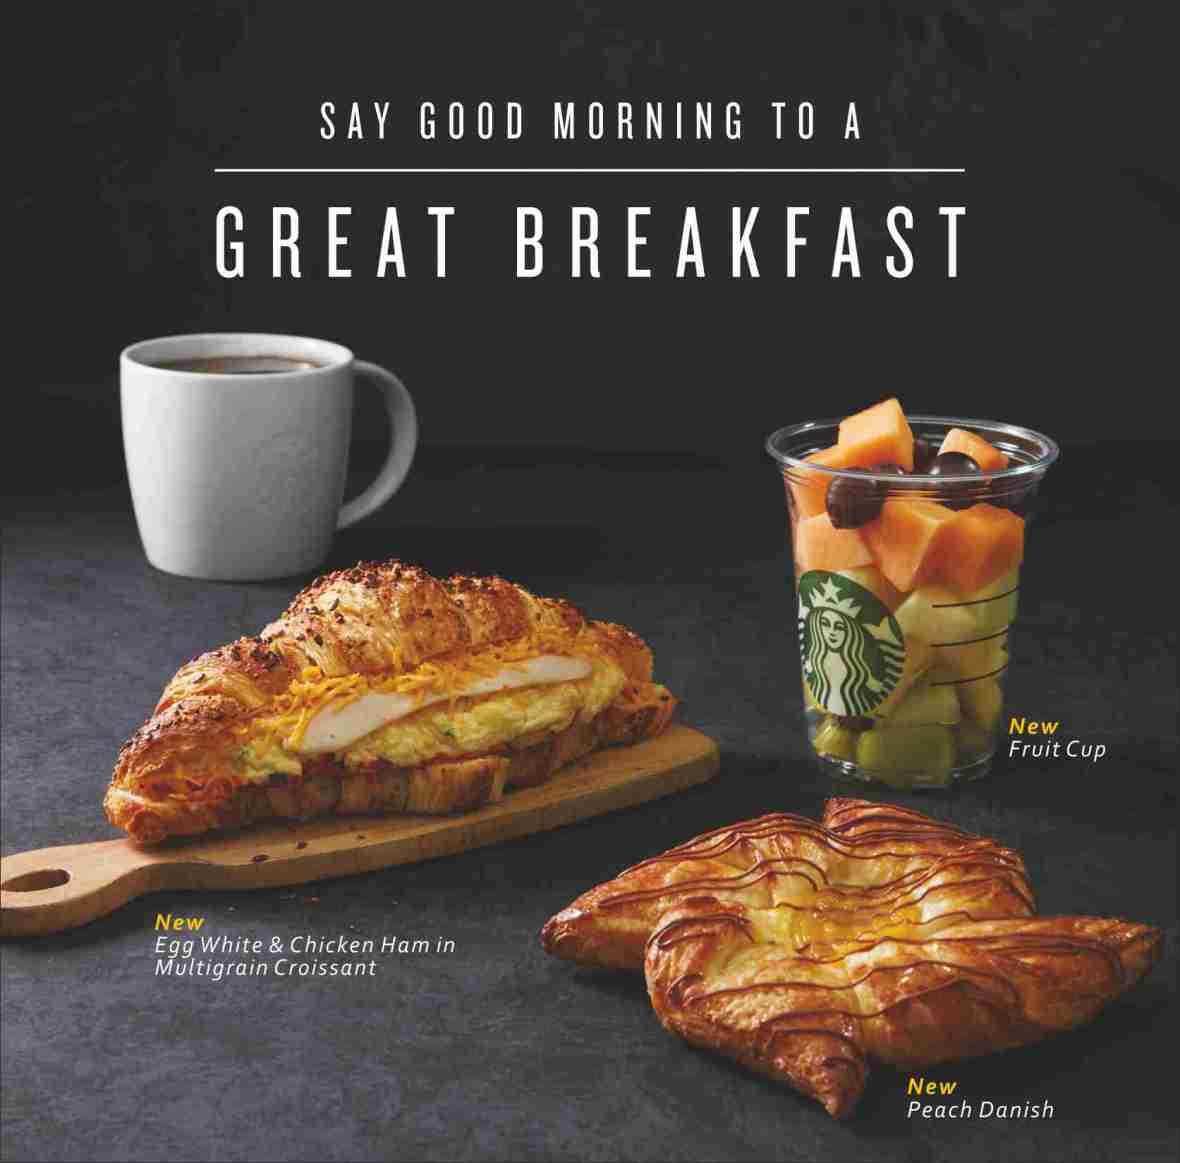 Starbucks Breakfast - food items